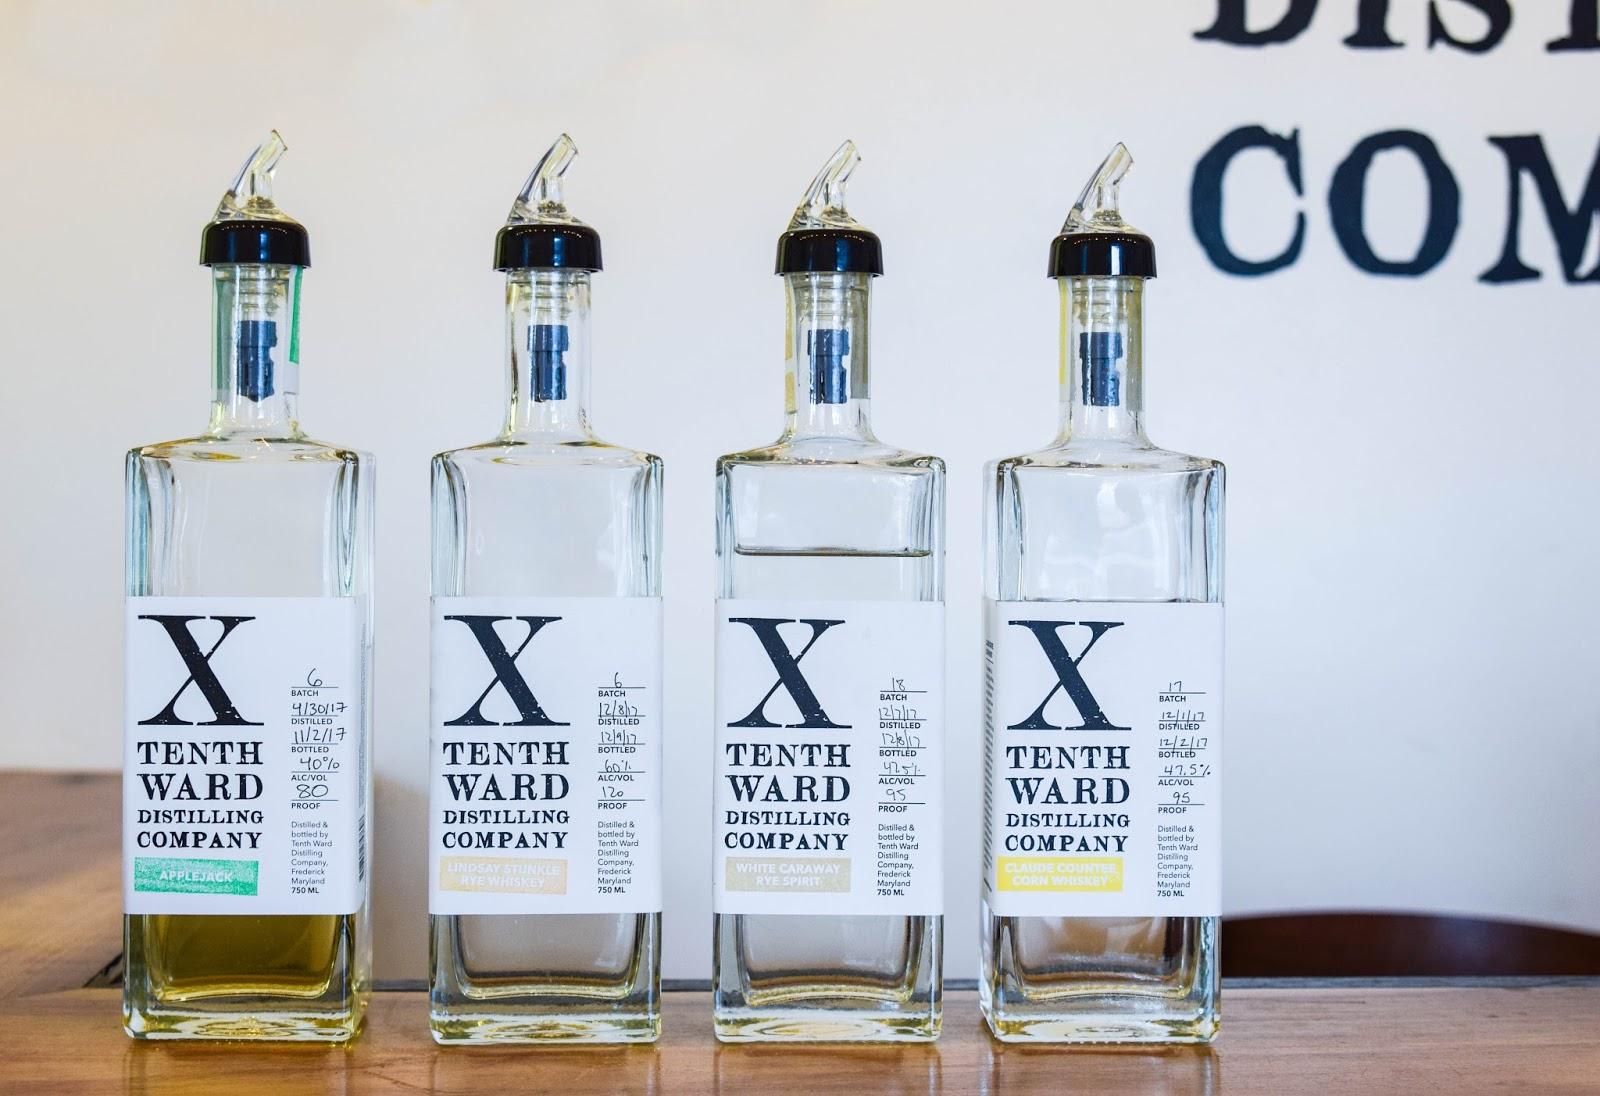 frederick maryland travel guide - visit frederick - frederick maryland distillery - romantic frederick maryland - tenth ward distilling